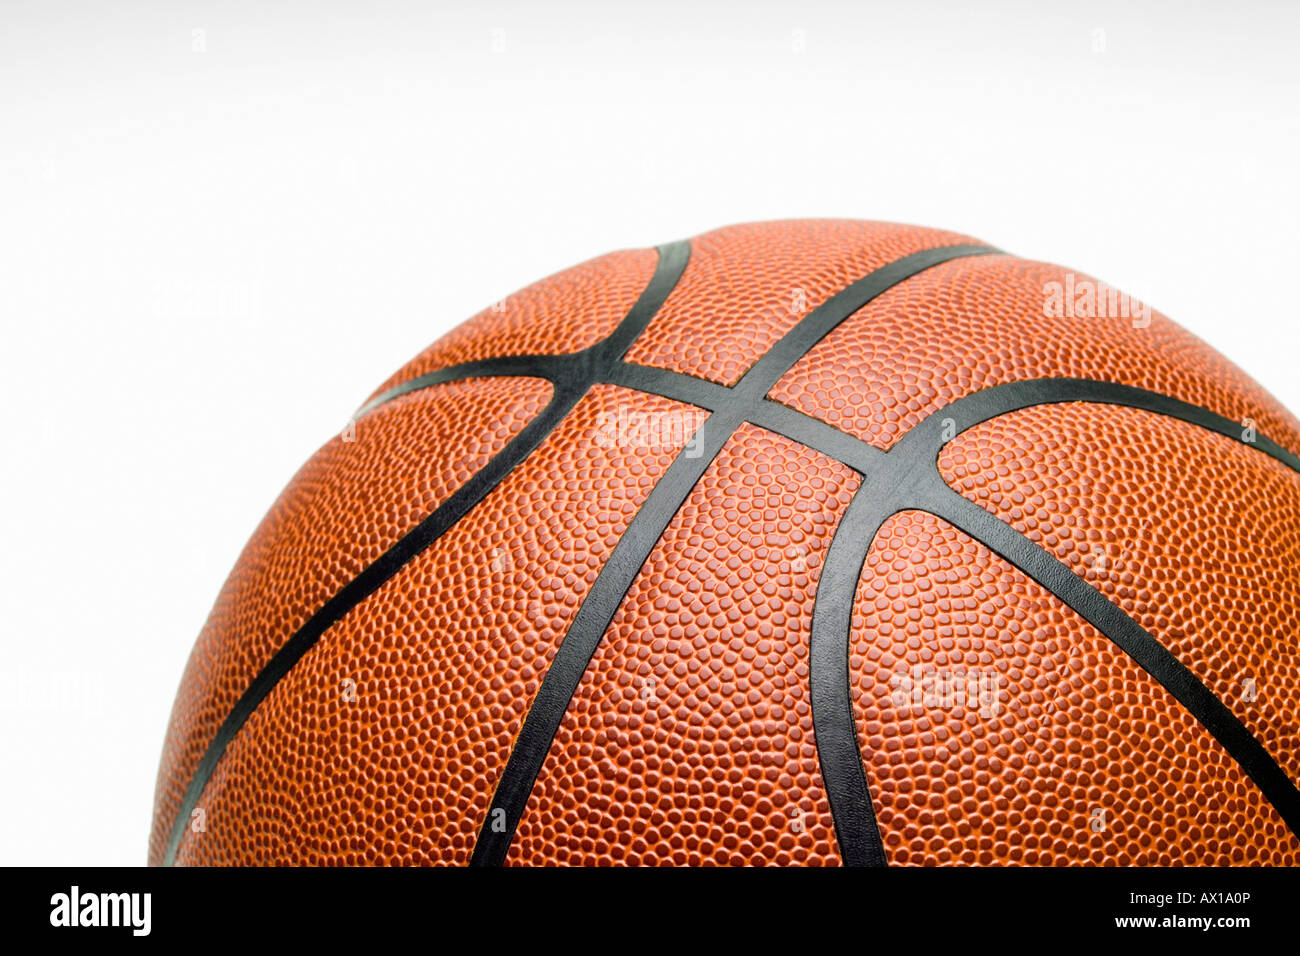 Foto de estudio, cerca de baloncesto Foto de stock